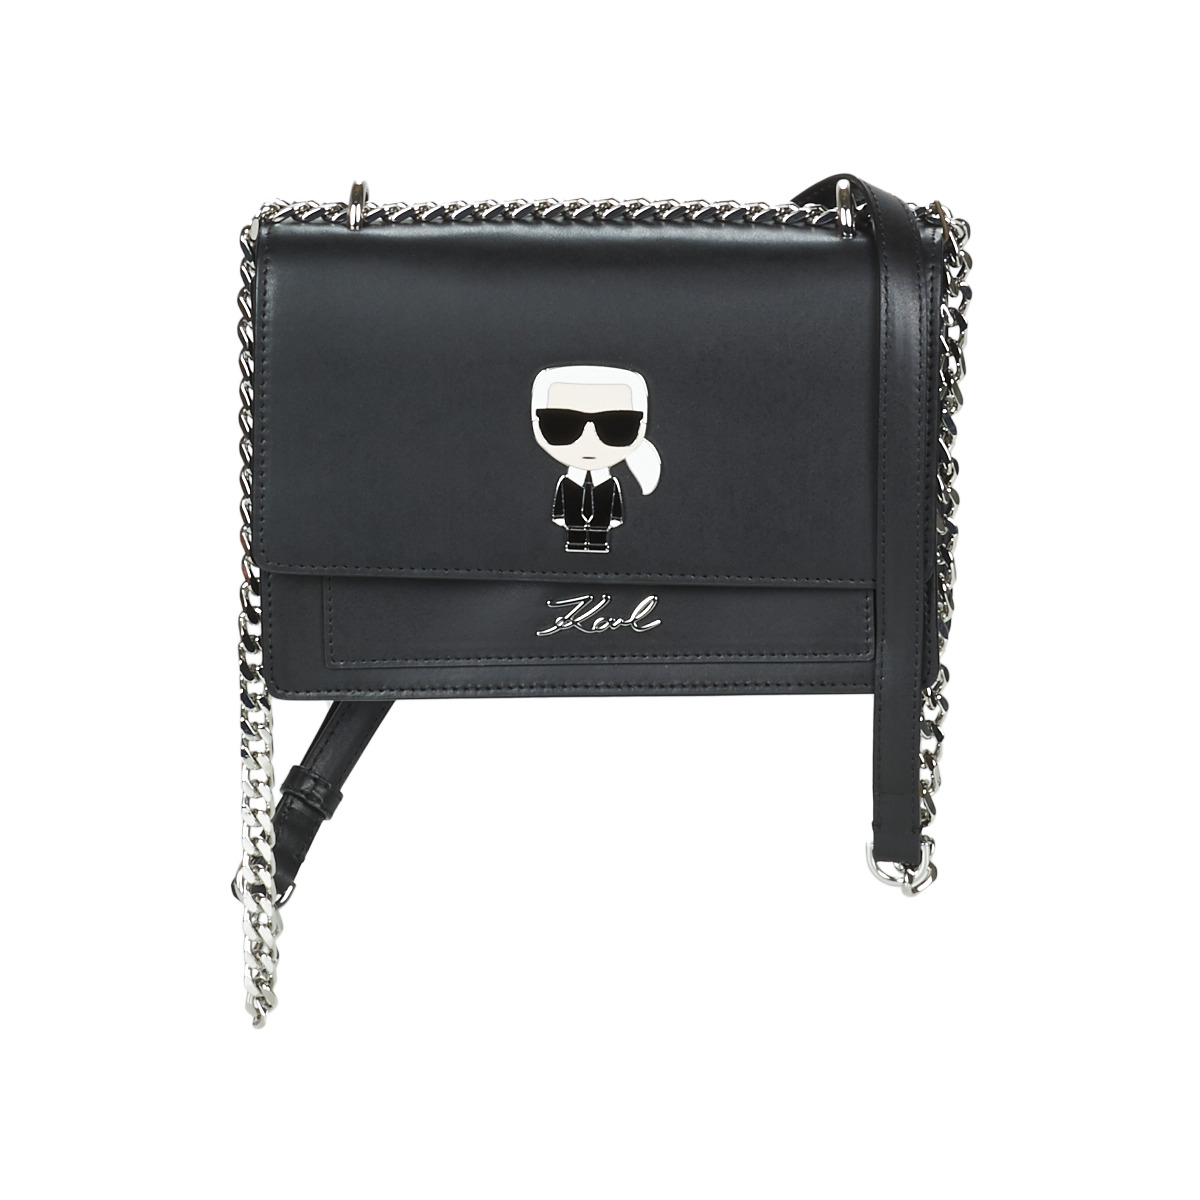 Borsa a spalla donna Karl Lagerfeld  K/IKONIC SHOULDER BAG Karl Lagerfeld 8720092045896